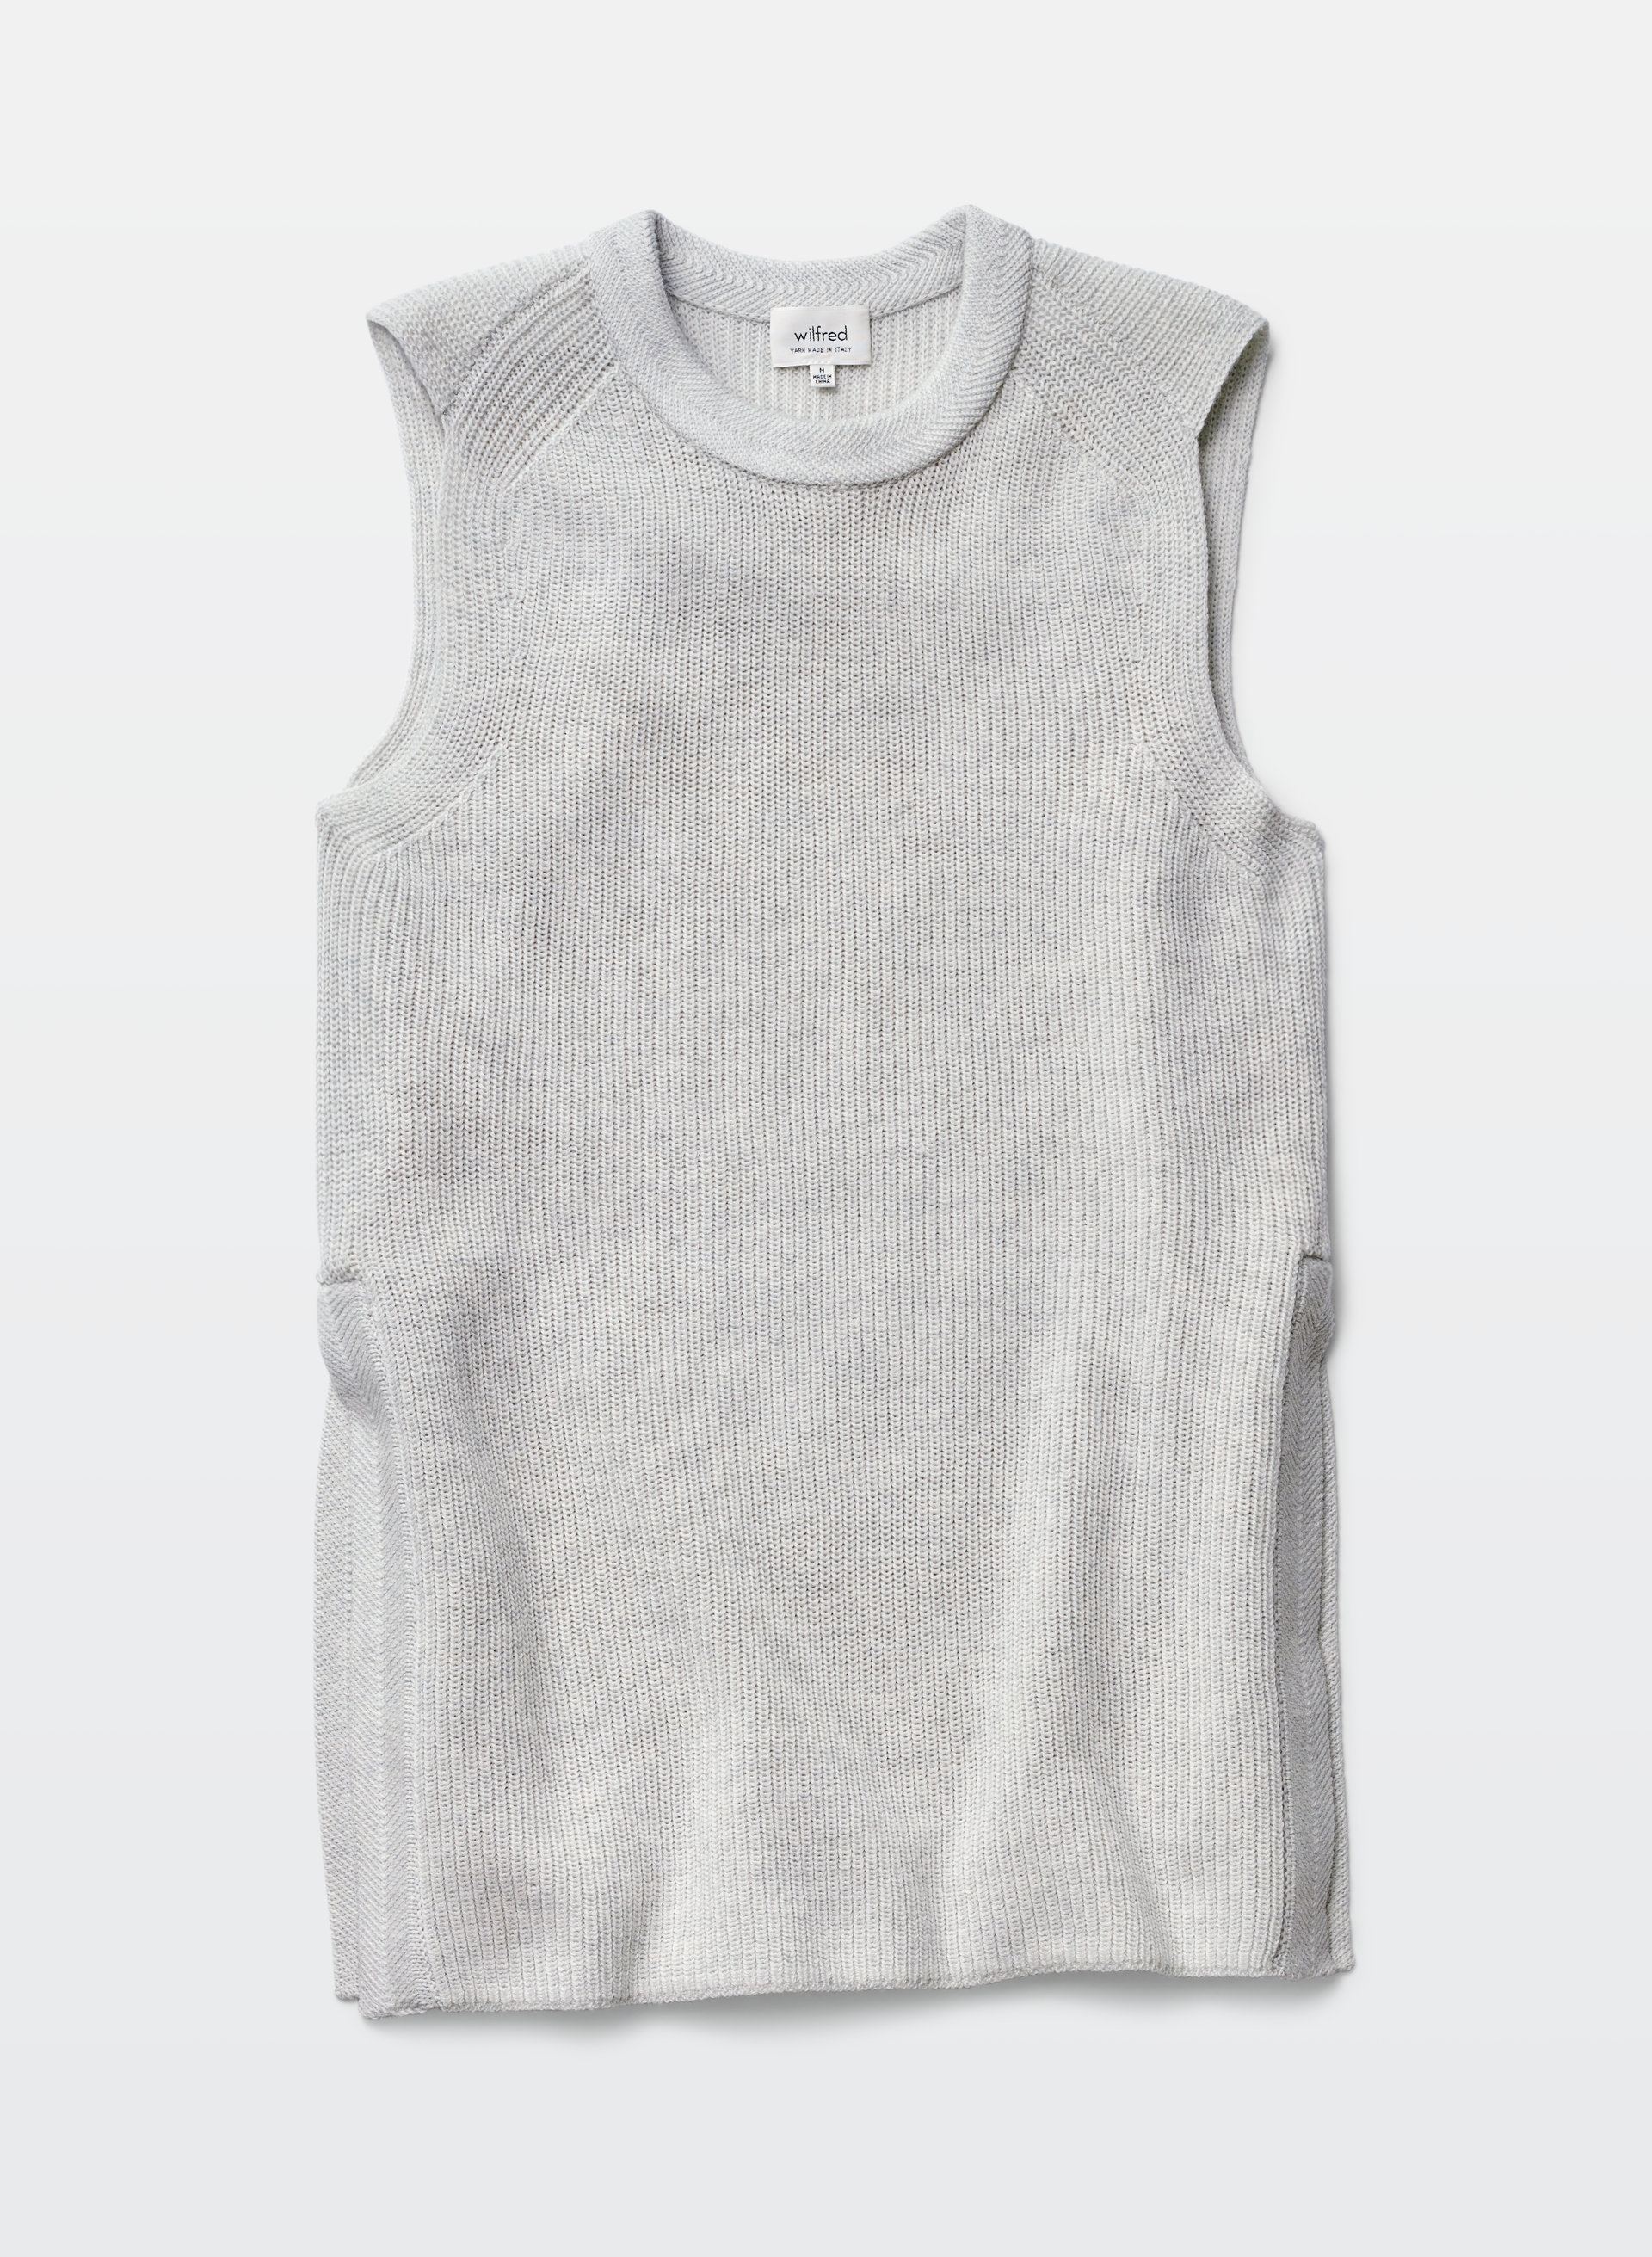 sleeveless sweater.jpg